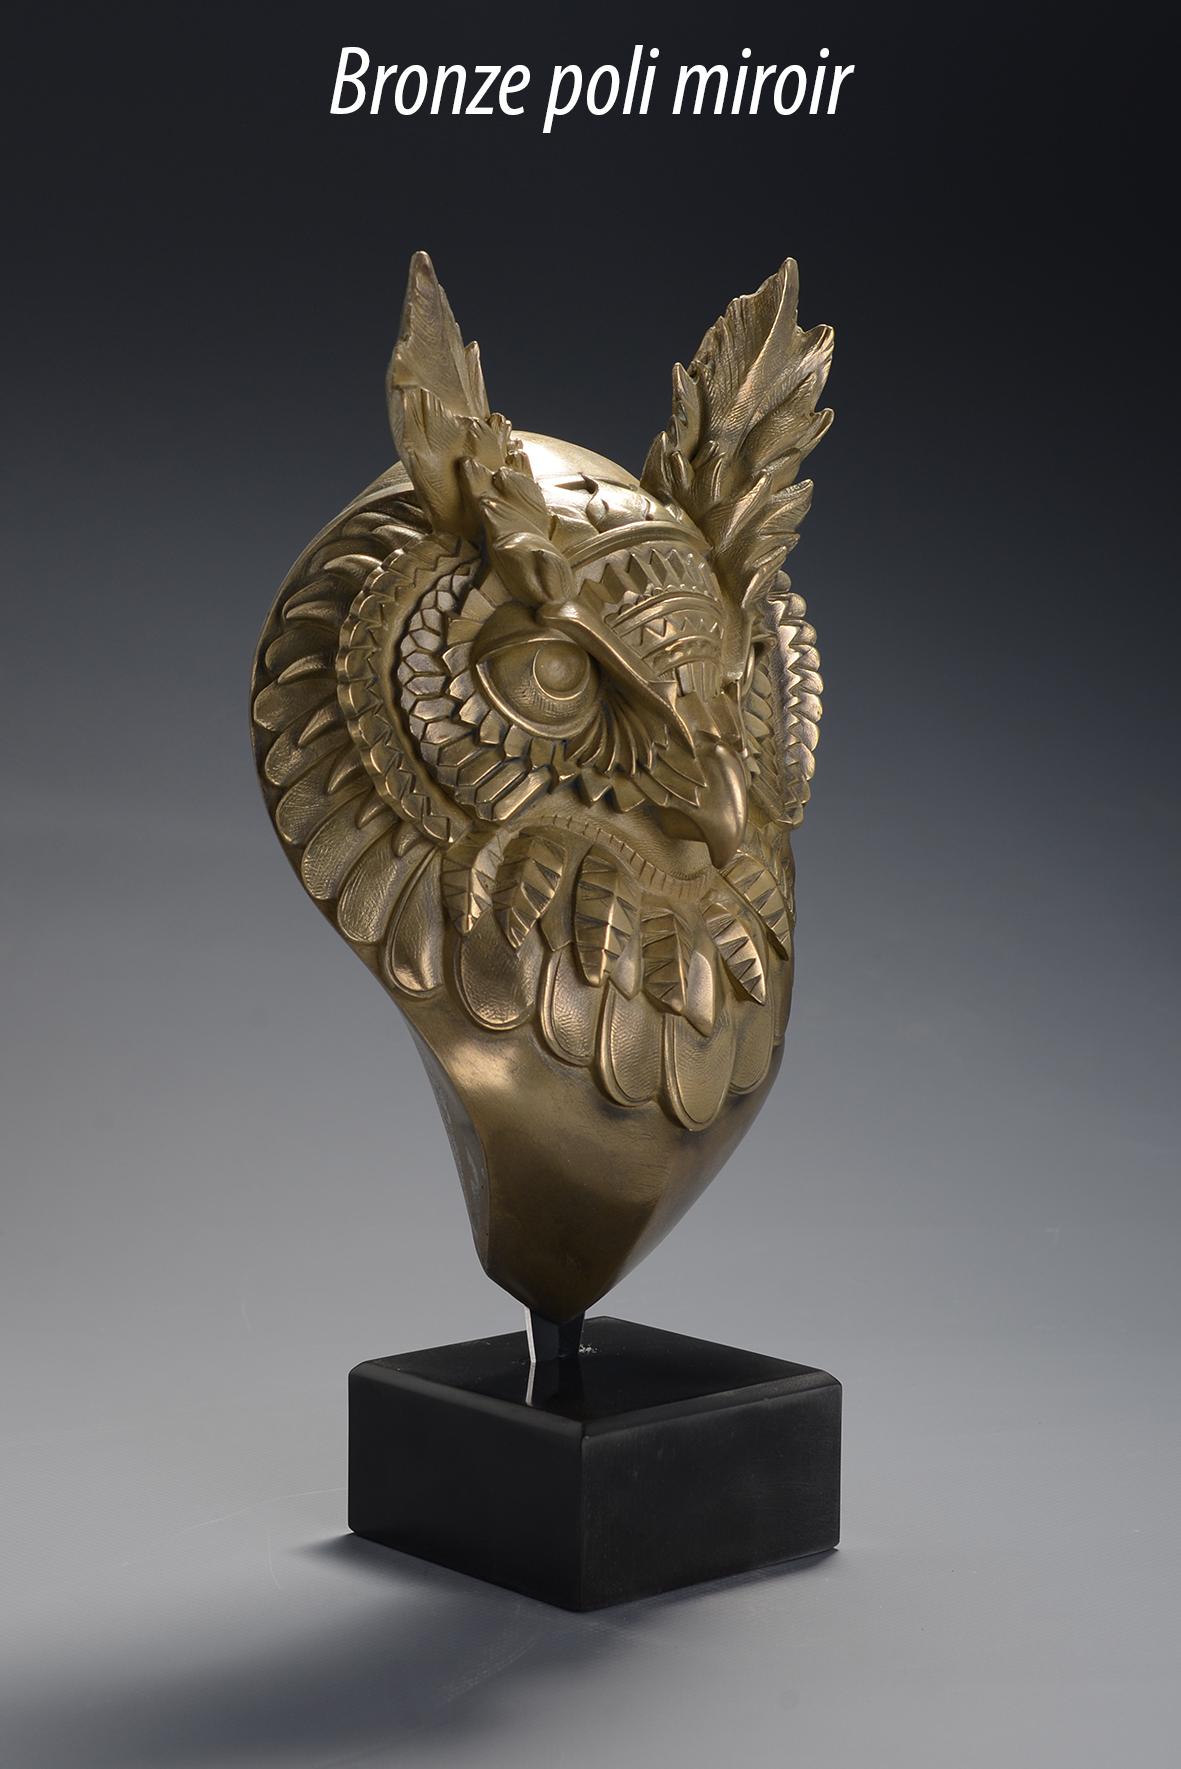 Bioworkz hornet owl poli miroir